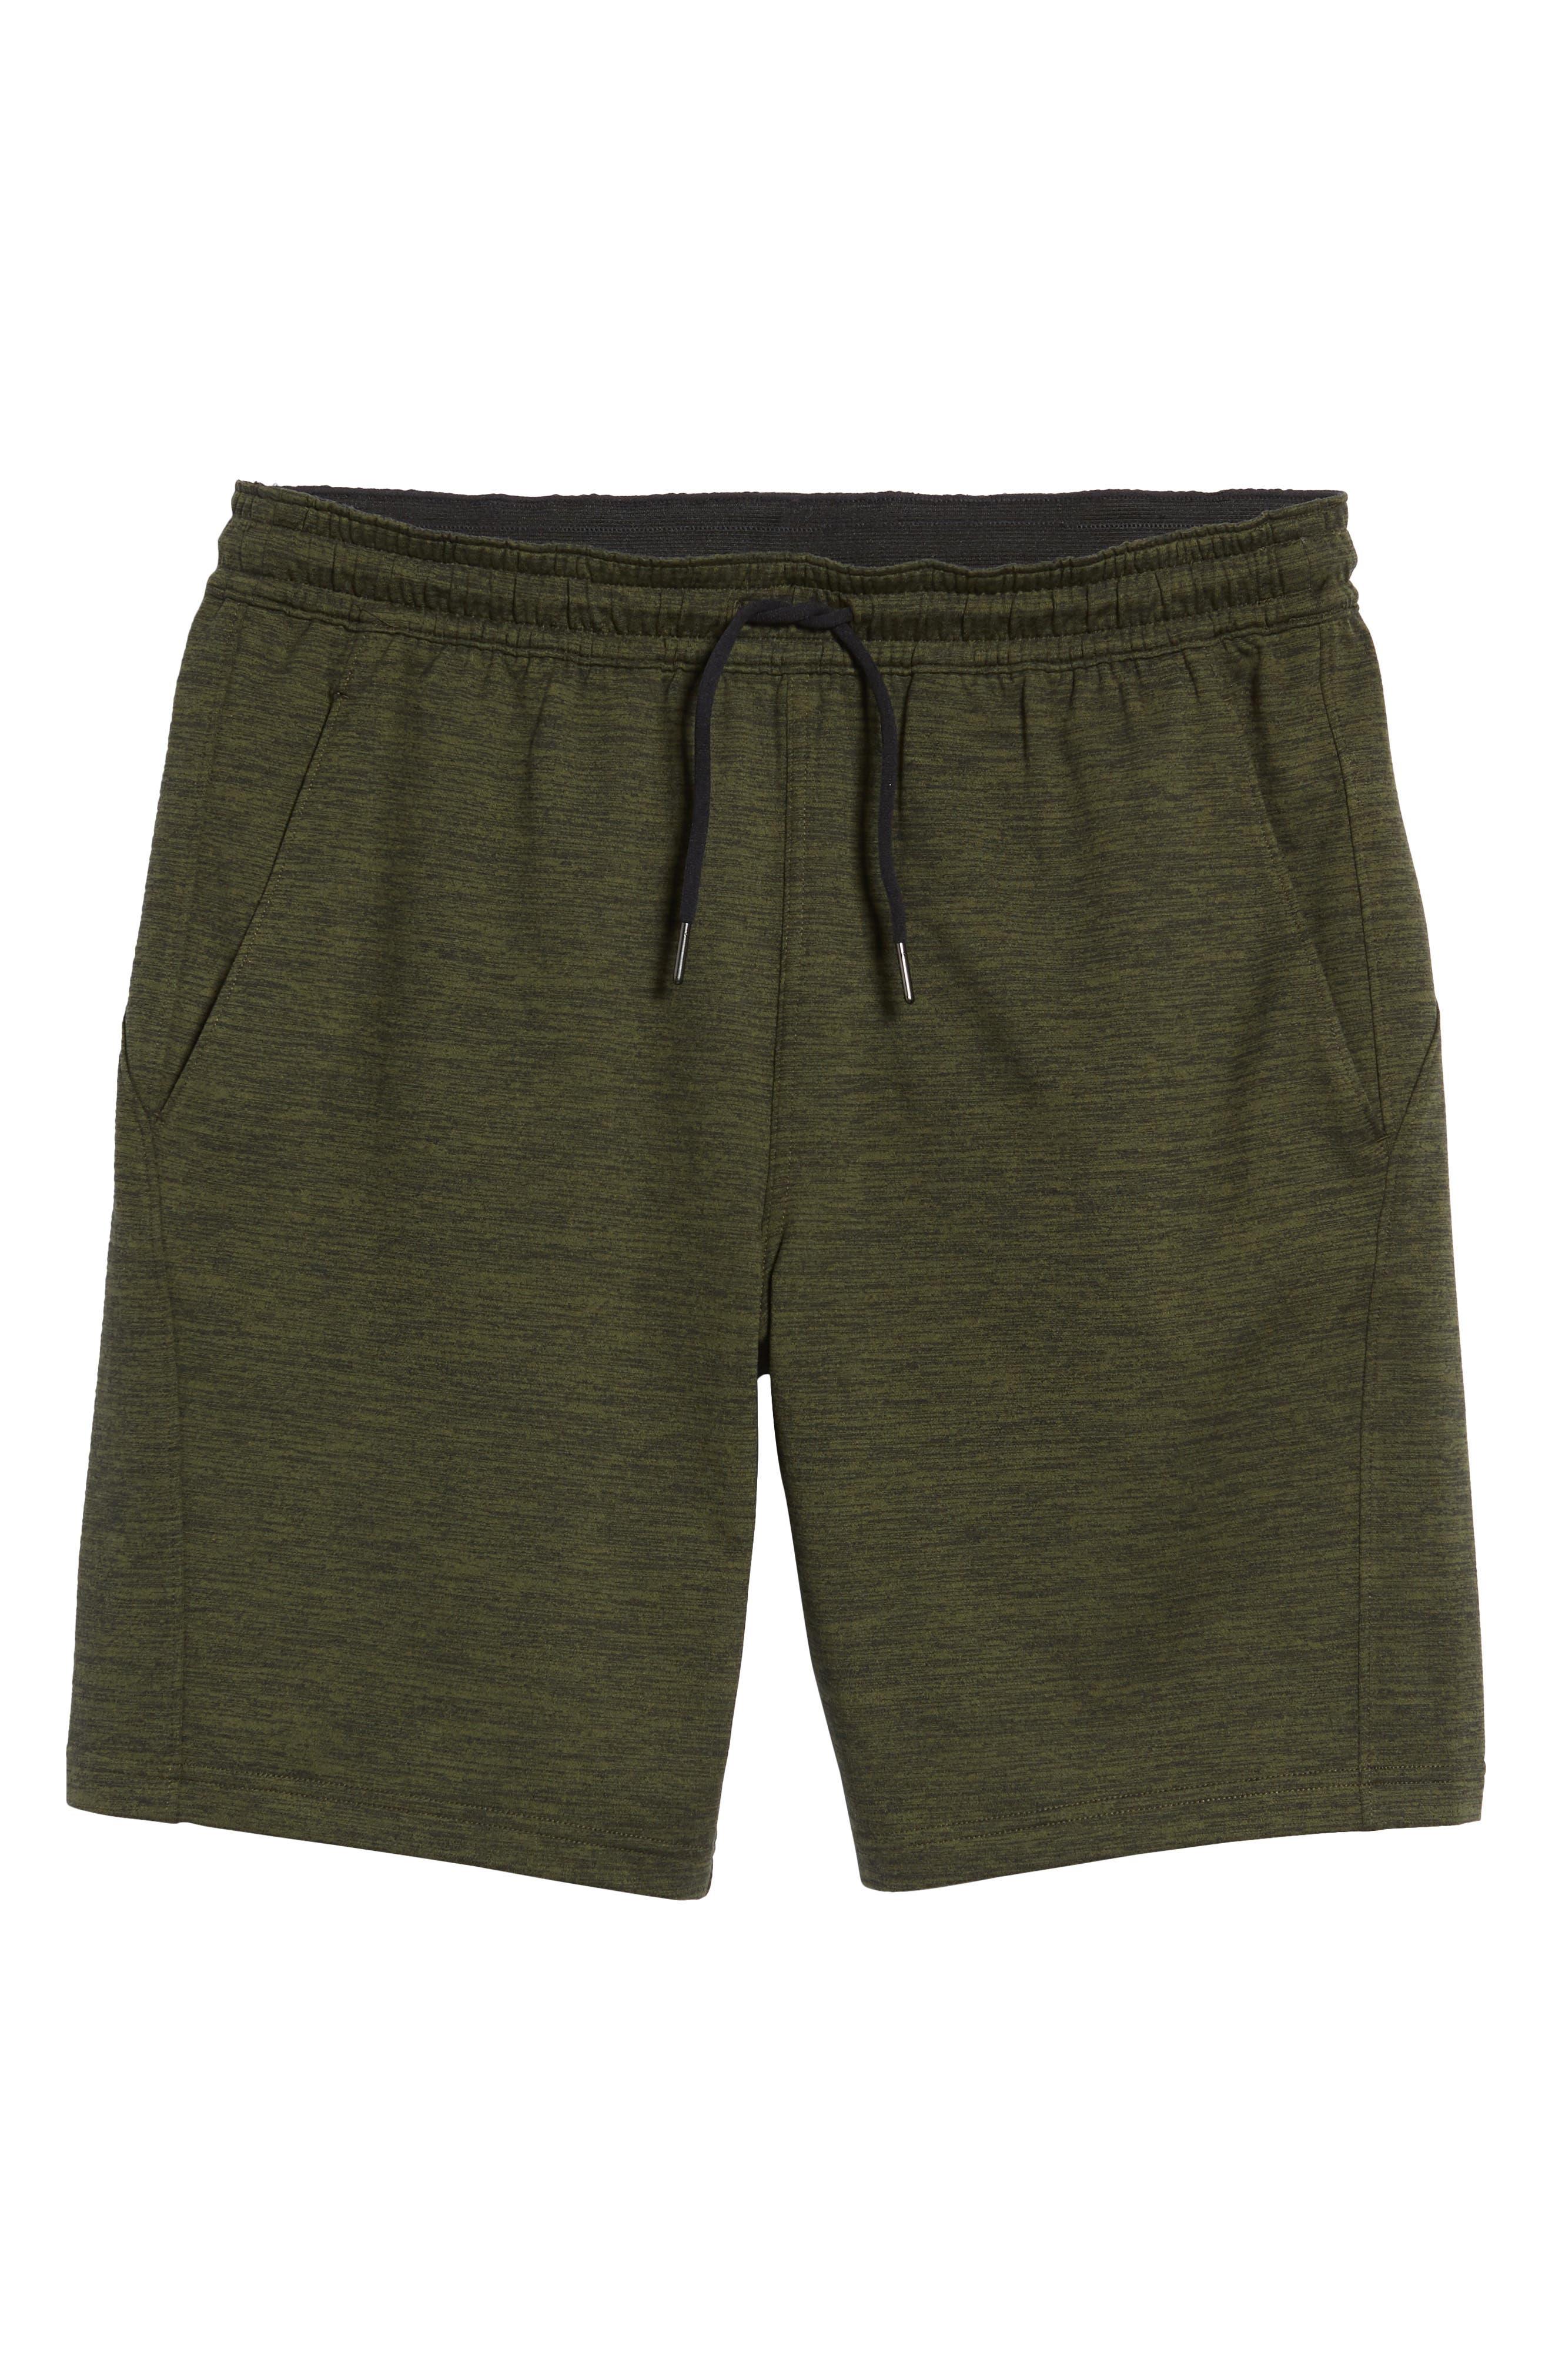 Pyrite Knit Shorts,                             Alternate thumbnail 22, color,